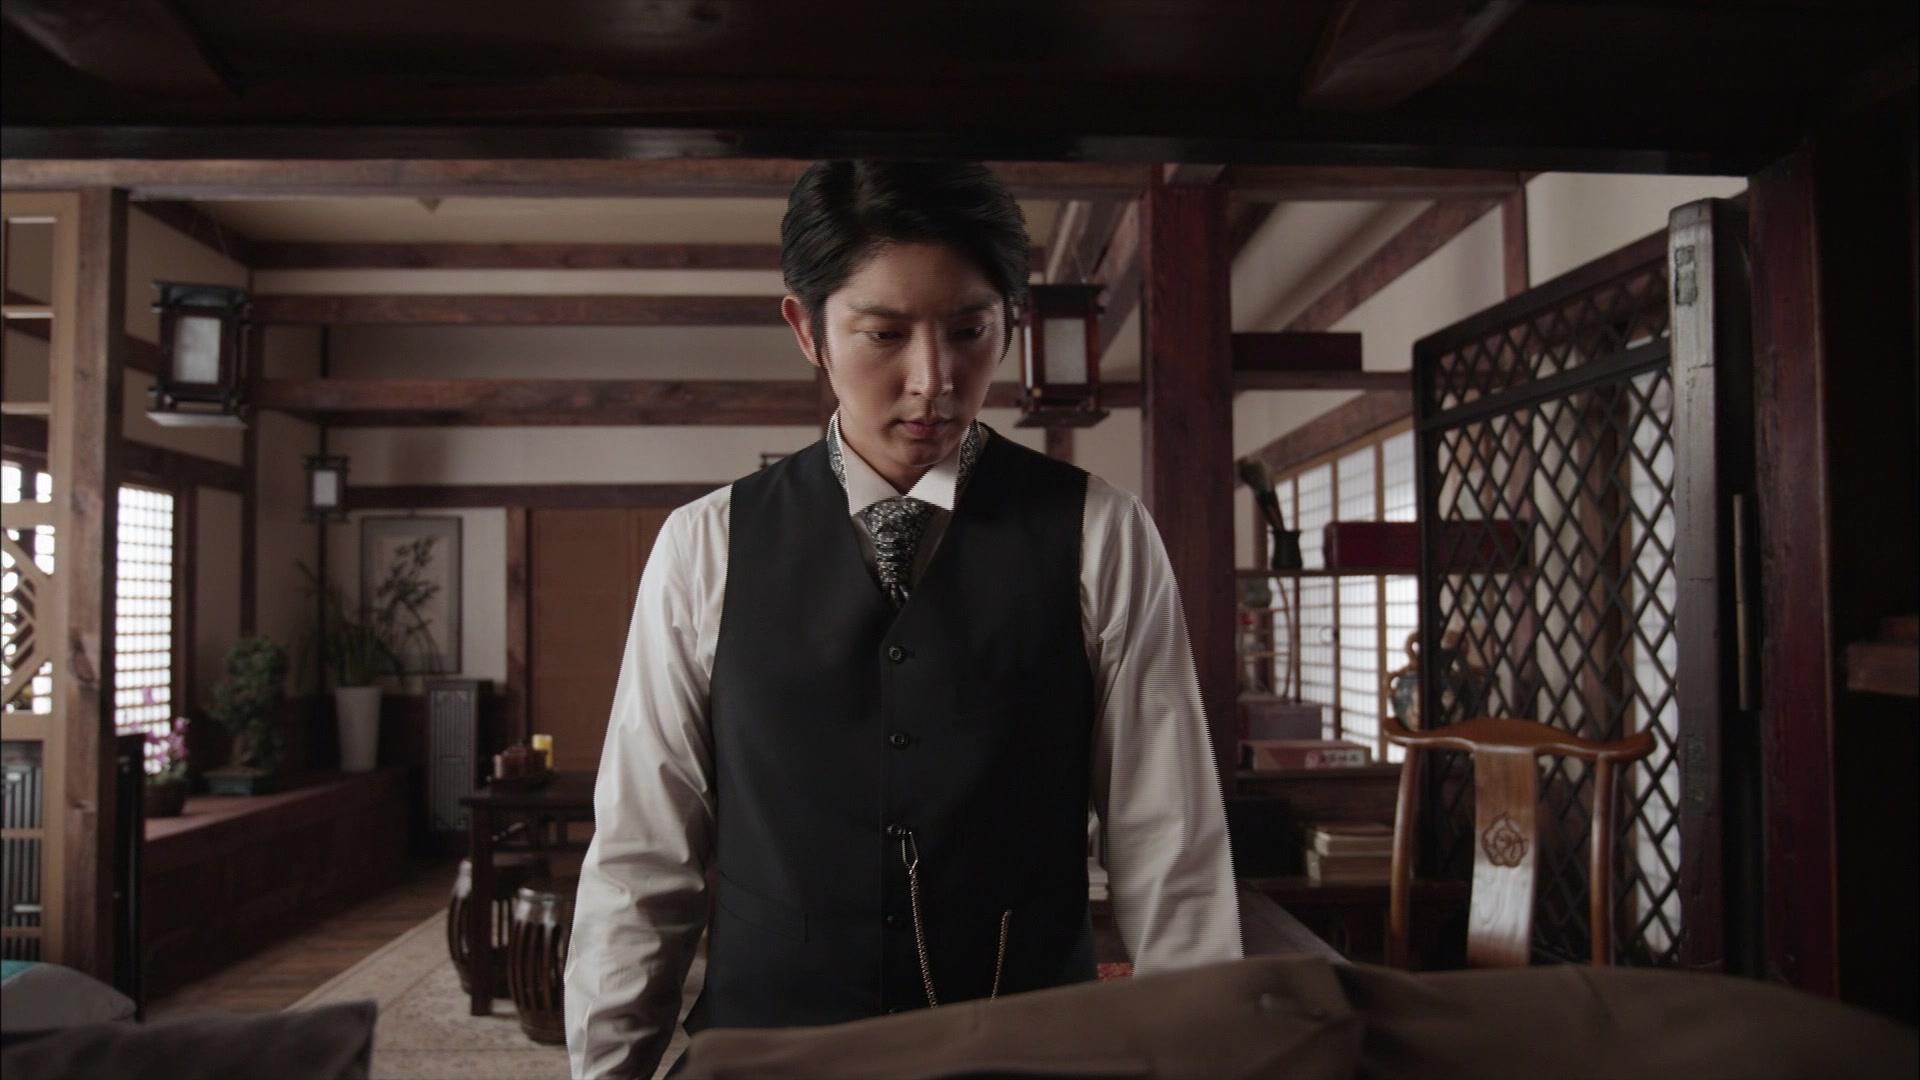 Gunman in Joseon Episode 11